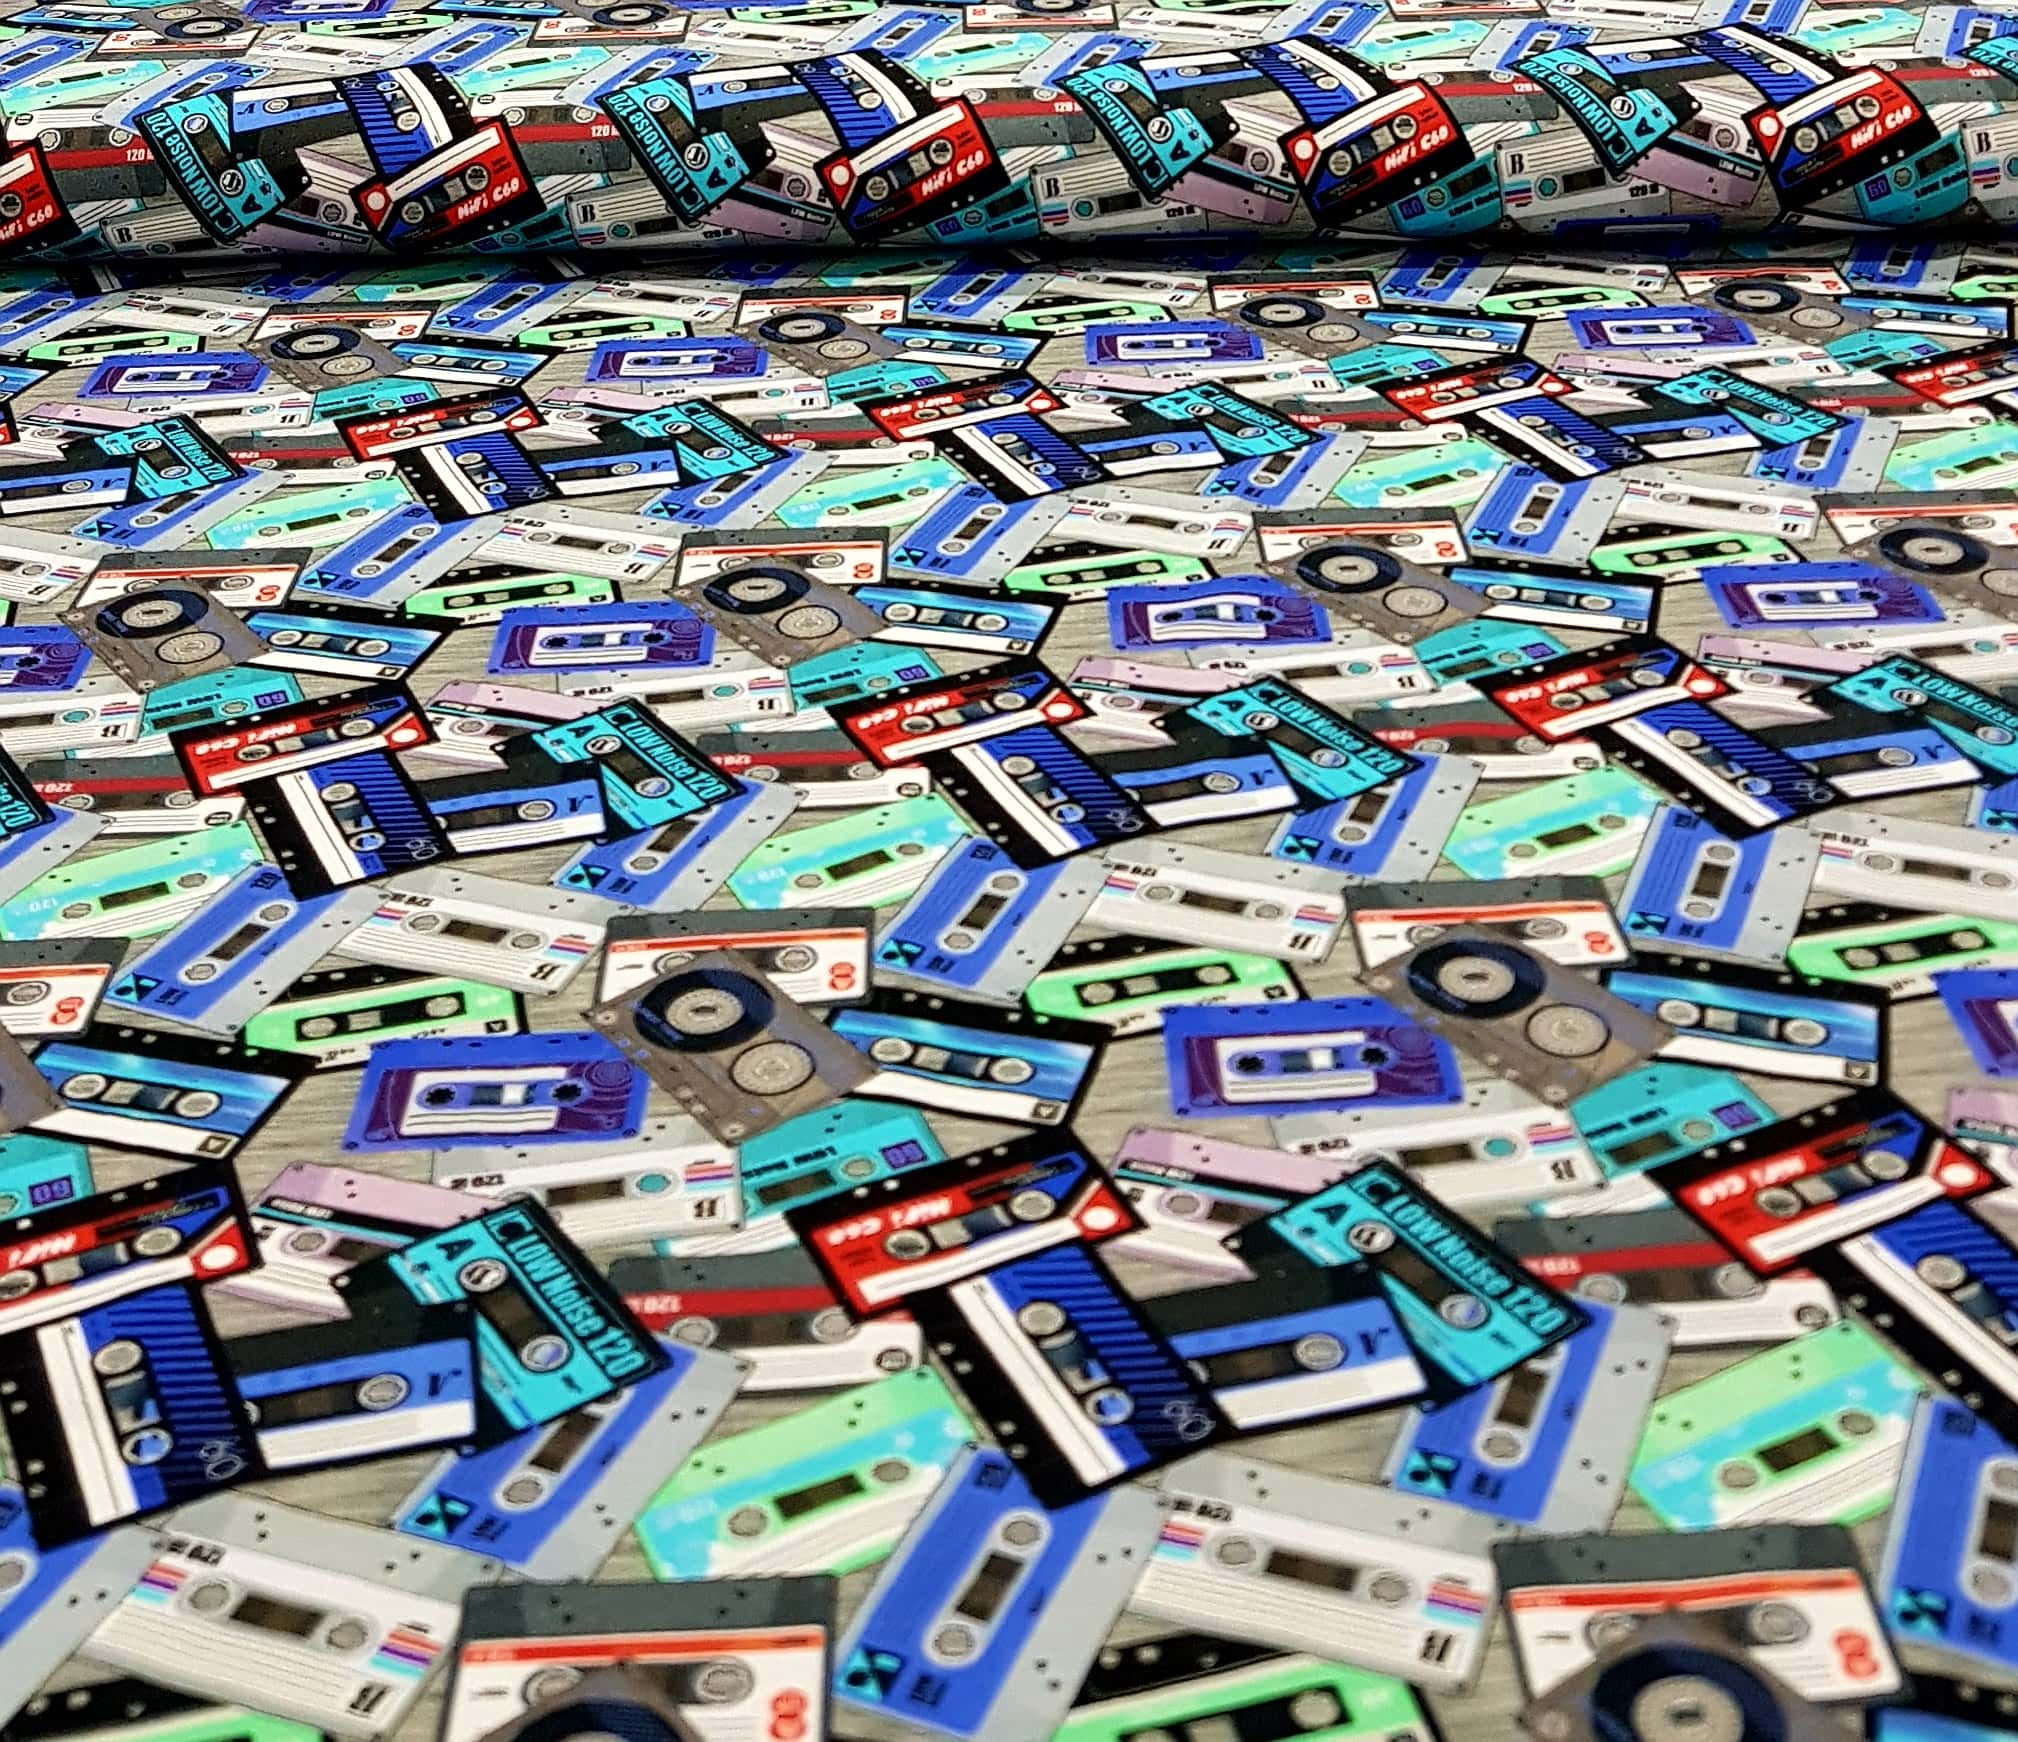 digitaletricotgekleurdecassettebandjesblauwmint-min